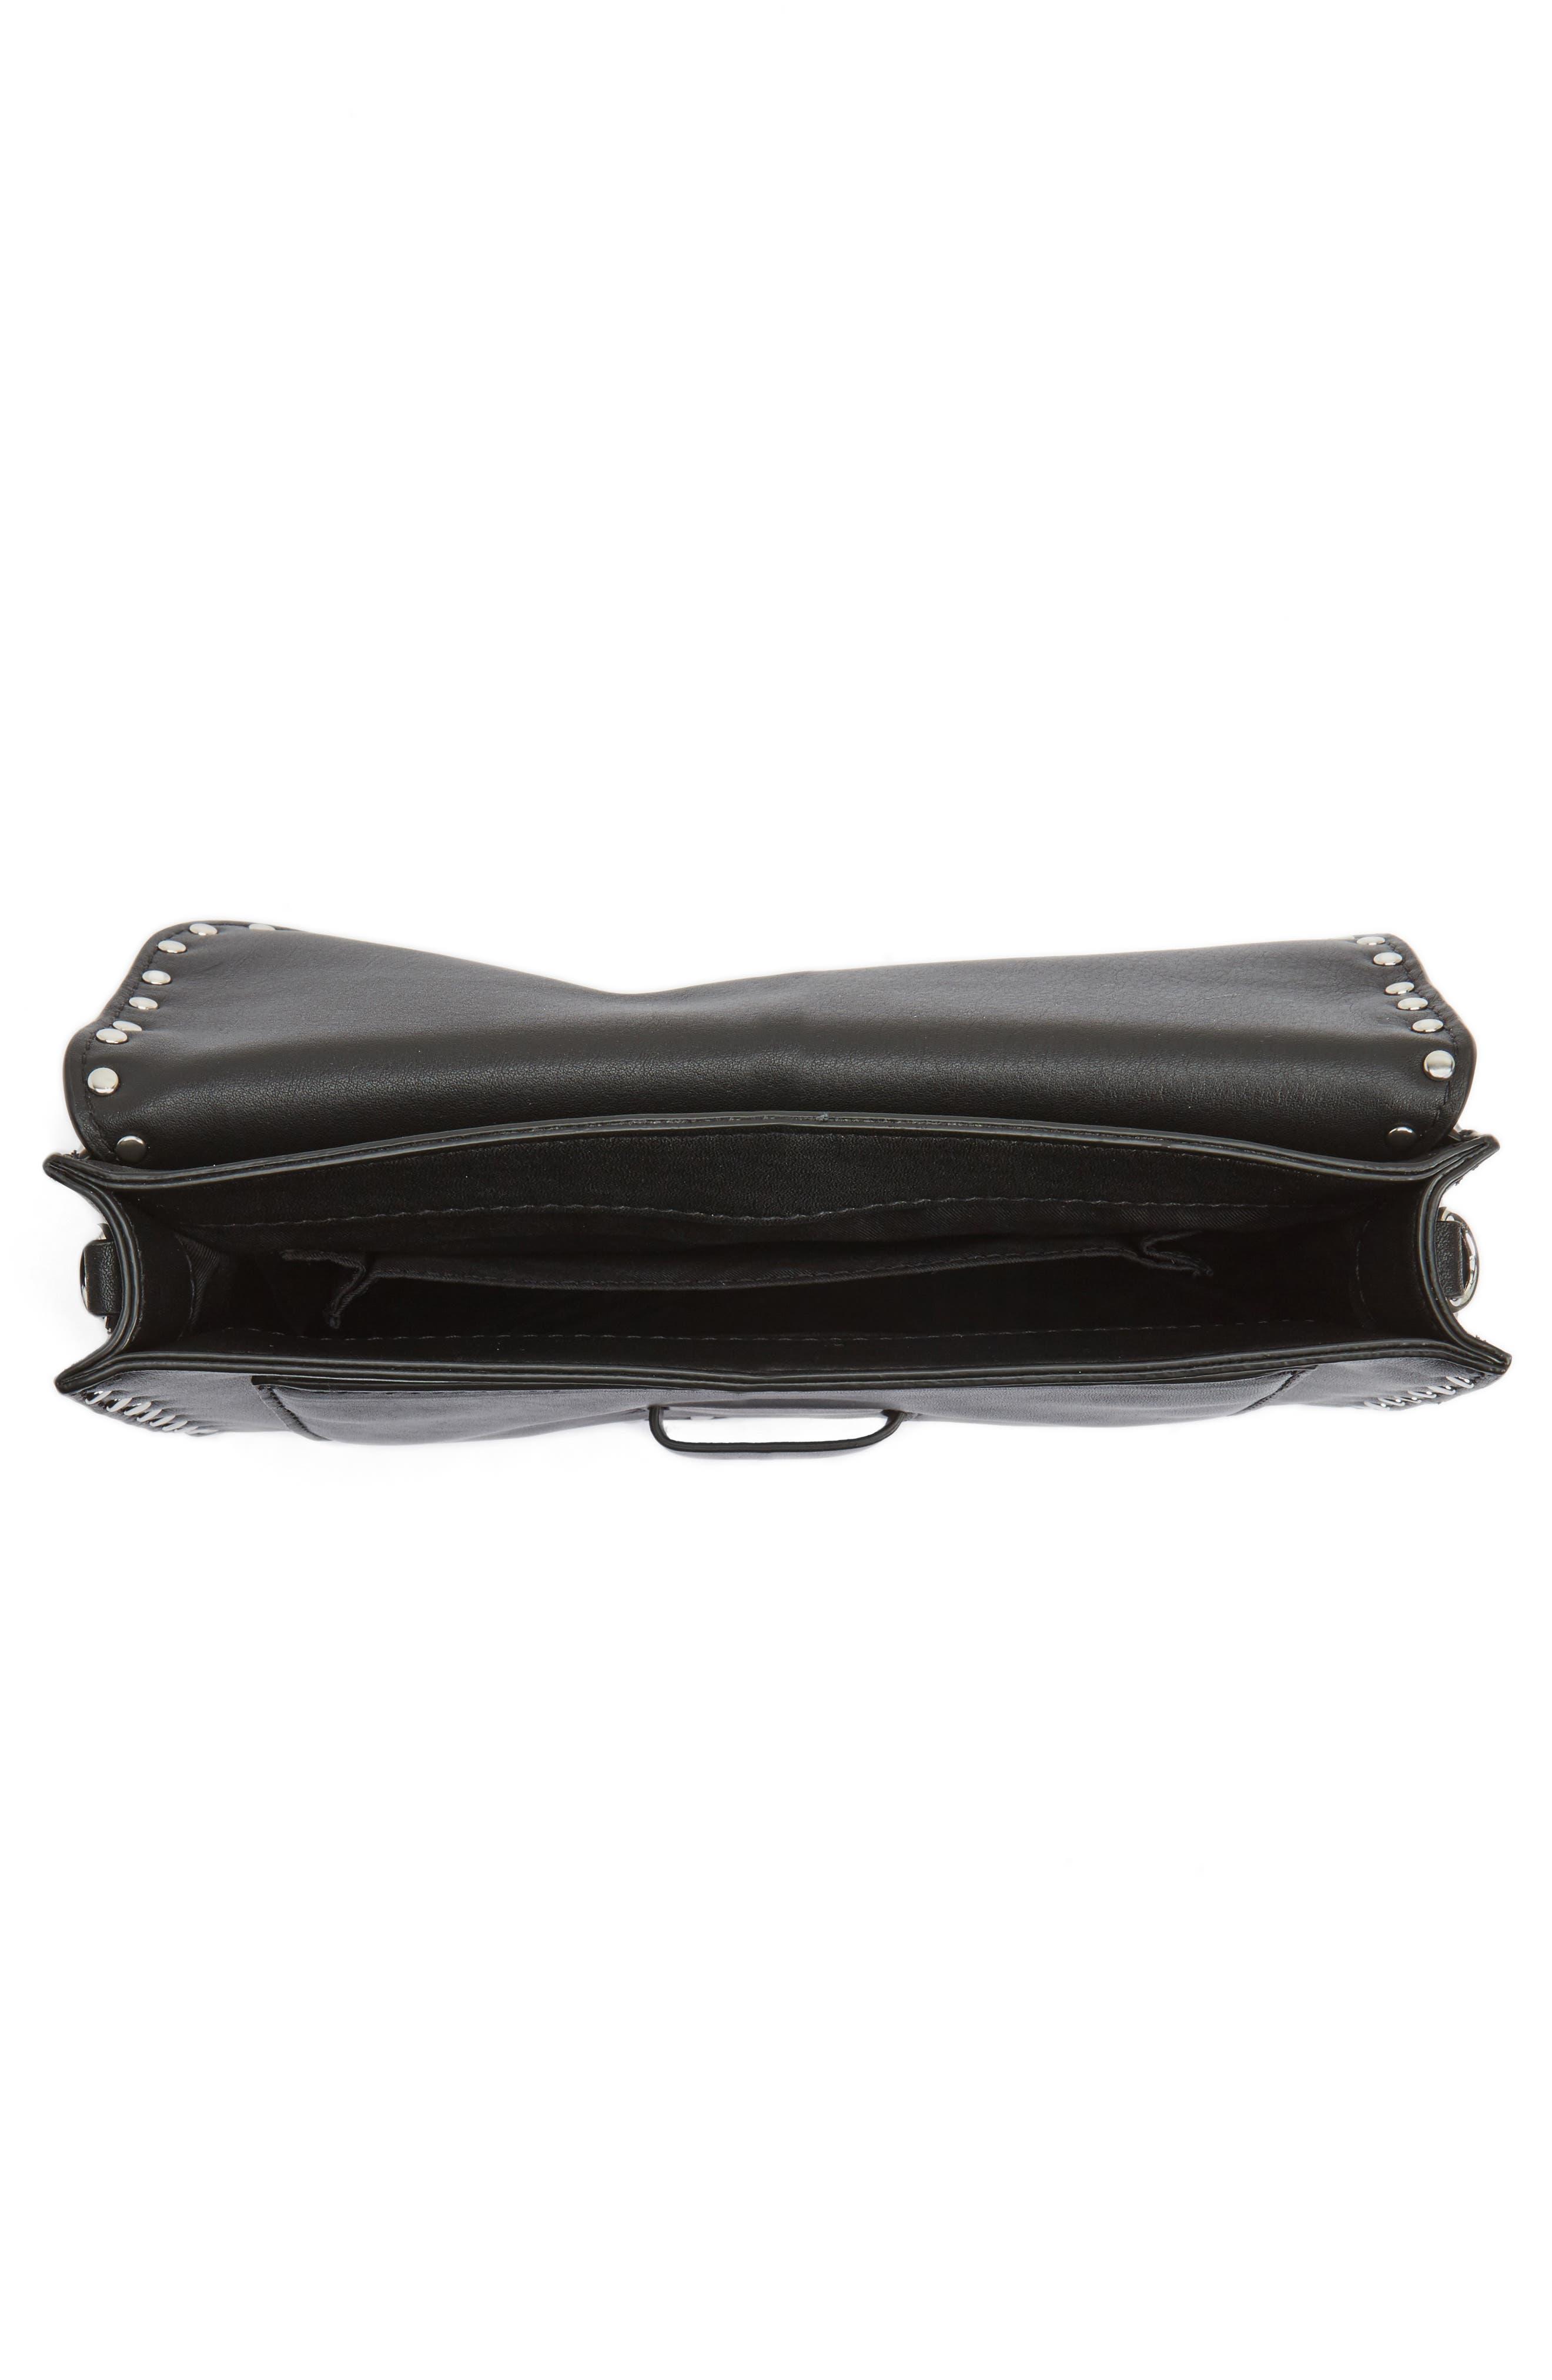 Medium Midnighter Leather Crossbody Bag,                             Alternate thumbnail 4, color,                             001